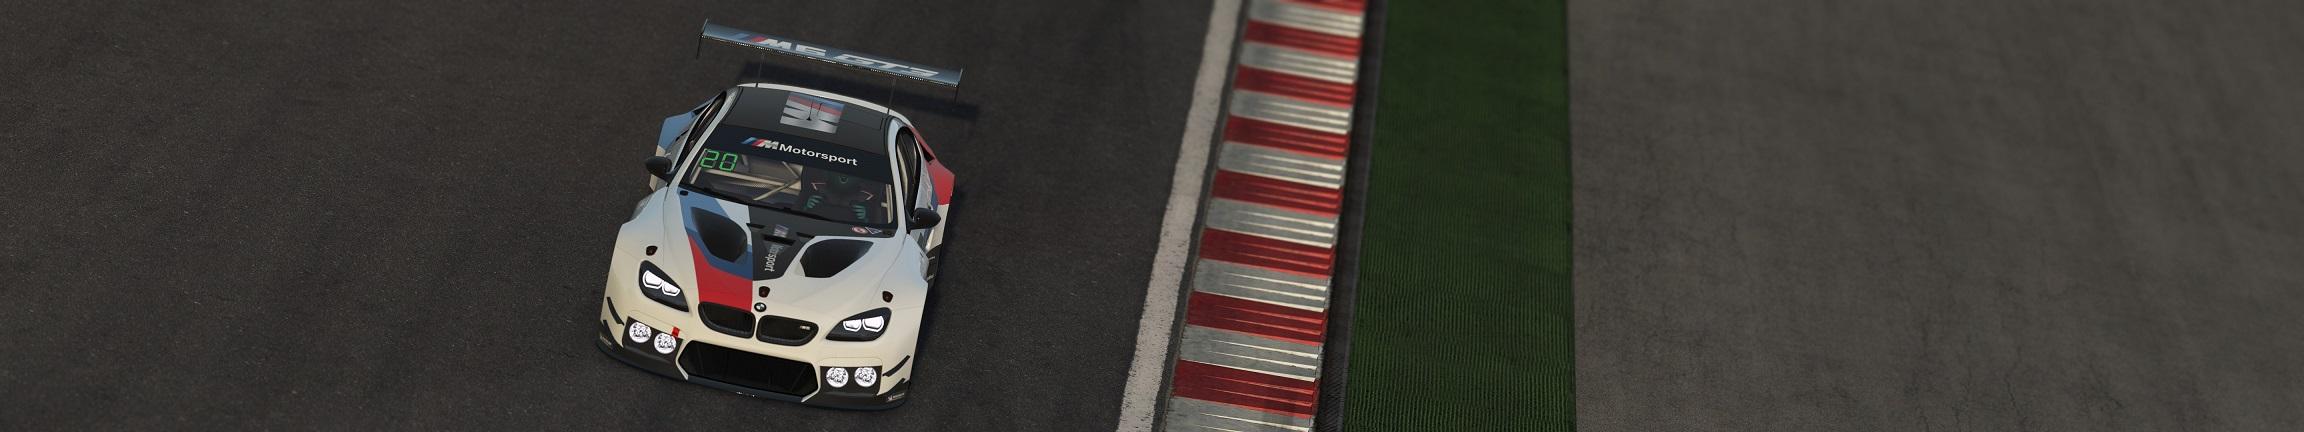 3 rF2 GT3 CHALLENGERS at PORTIMAO bmw top copy.jpg